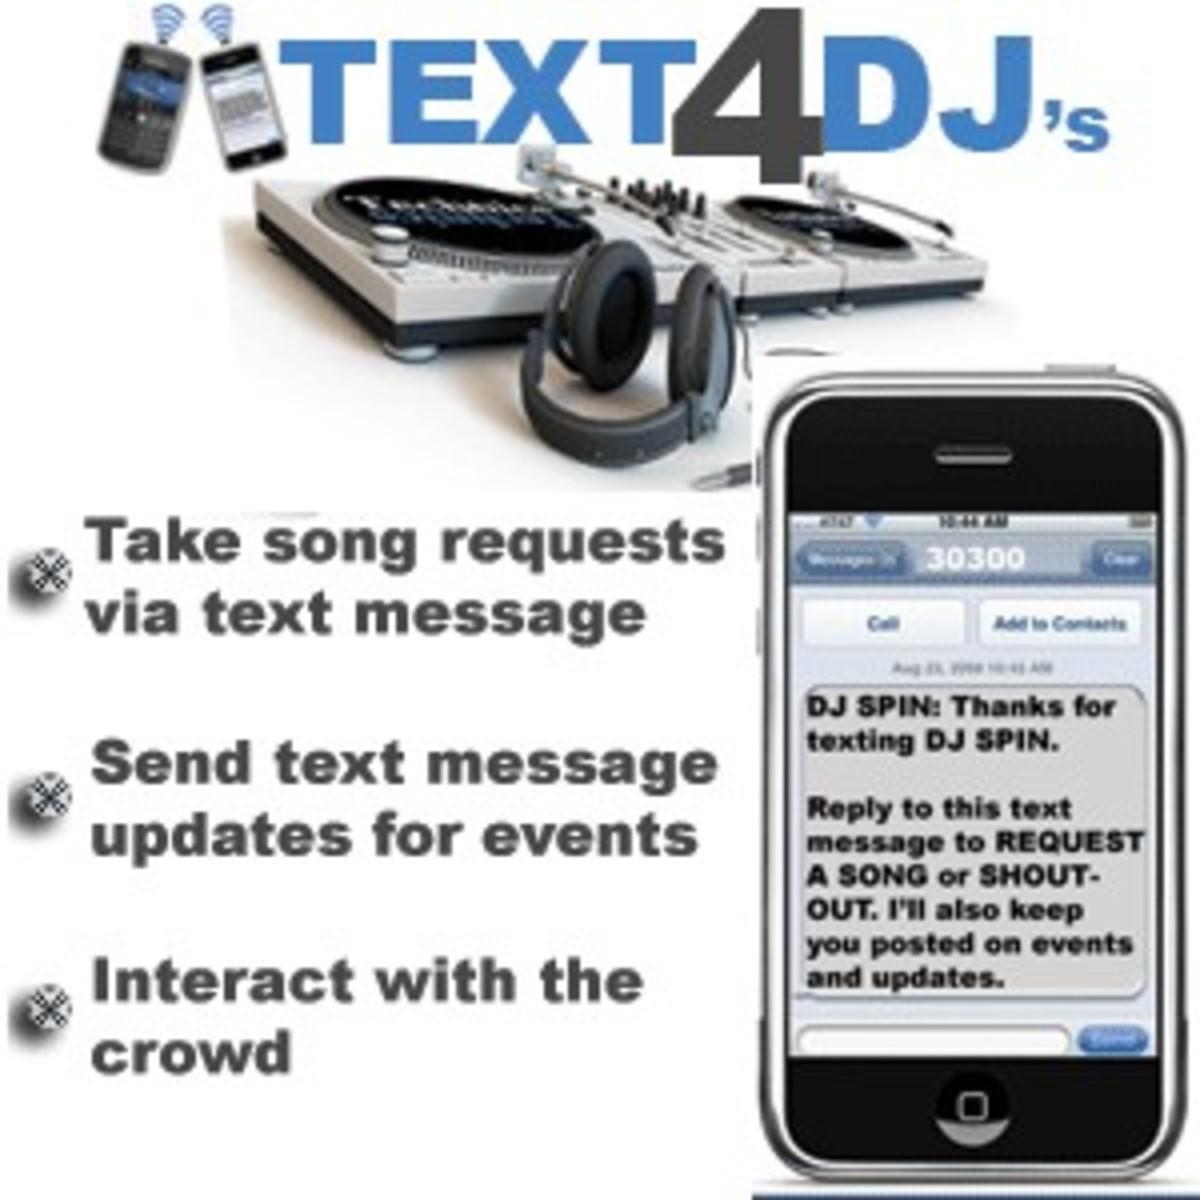 text4djs.jpg